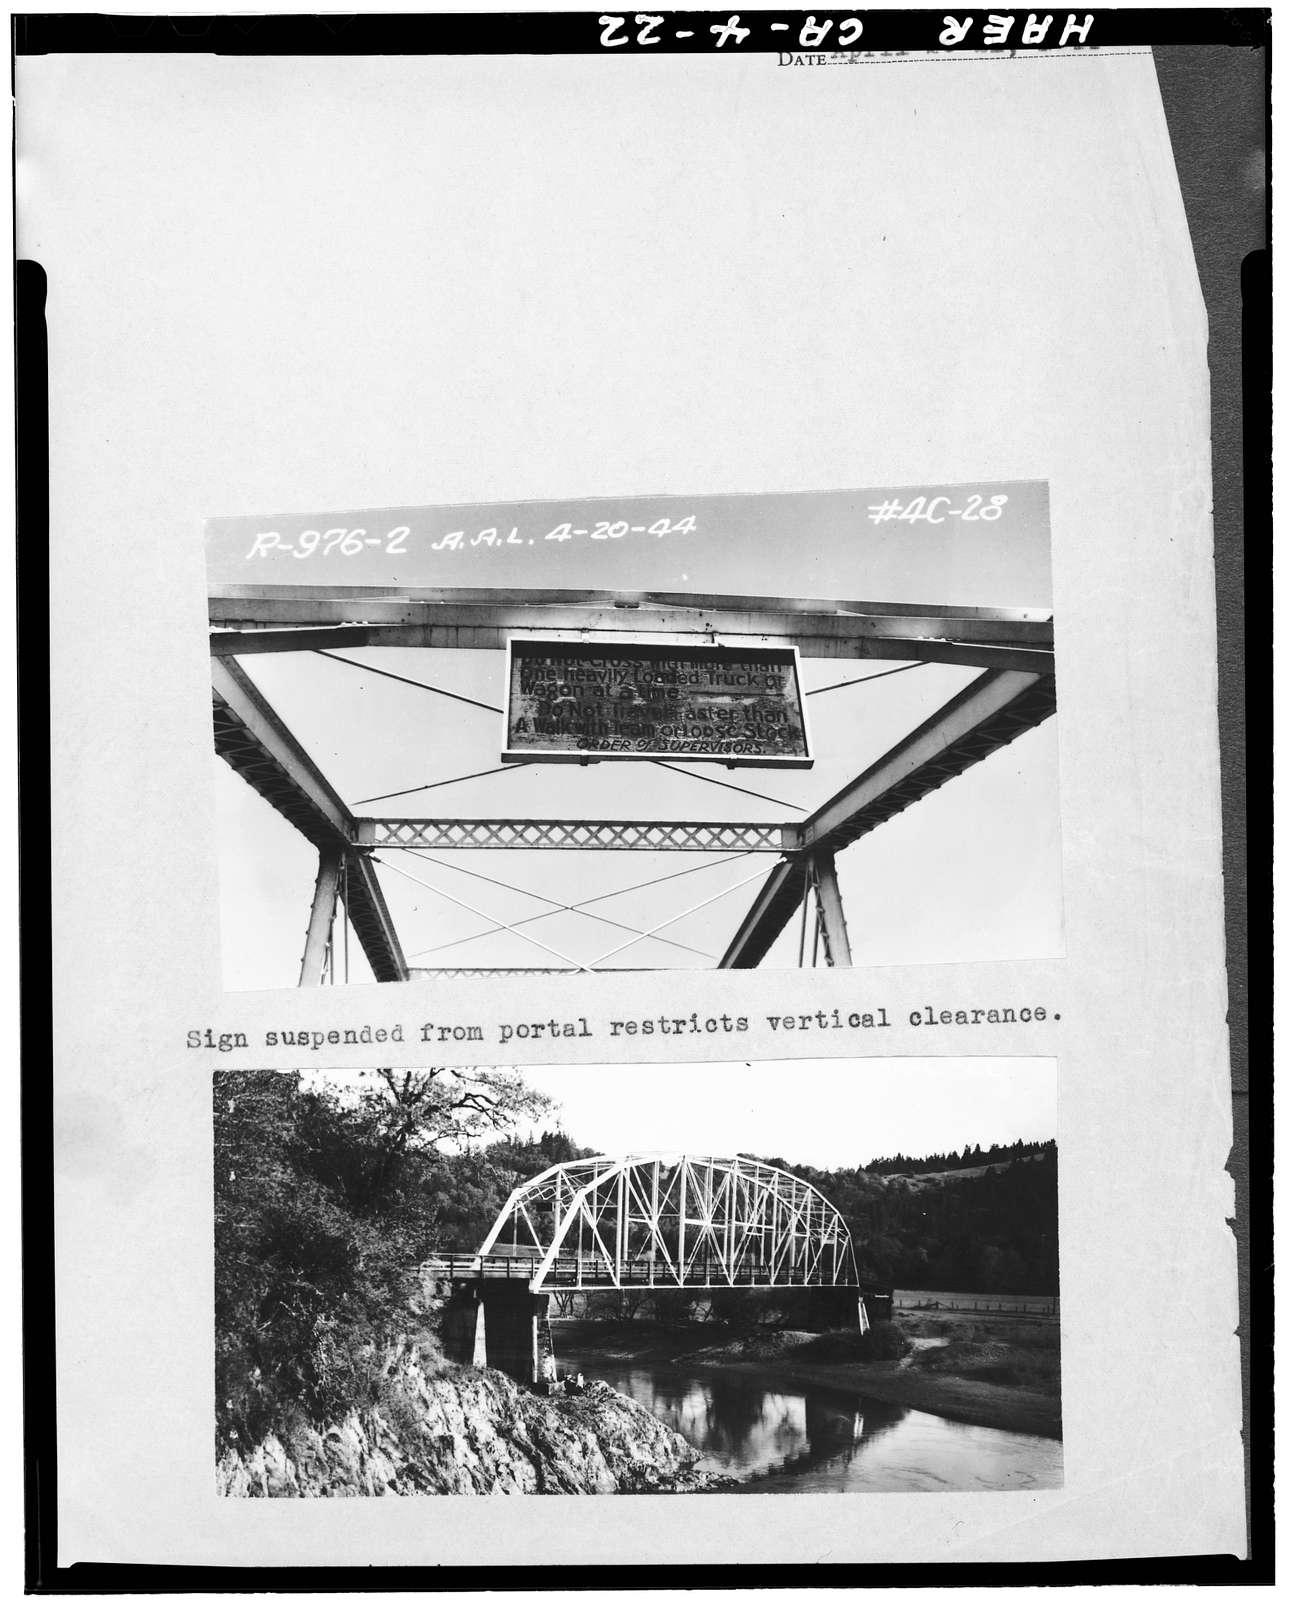 Moody Bridge, Spanning South Fork Eel River, Garberville, Humboldt County, CA